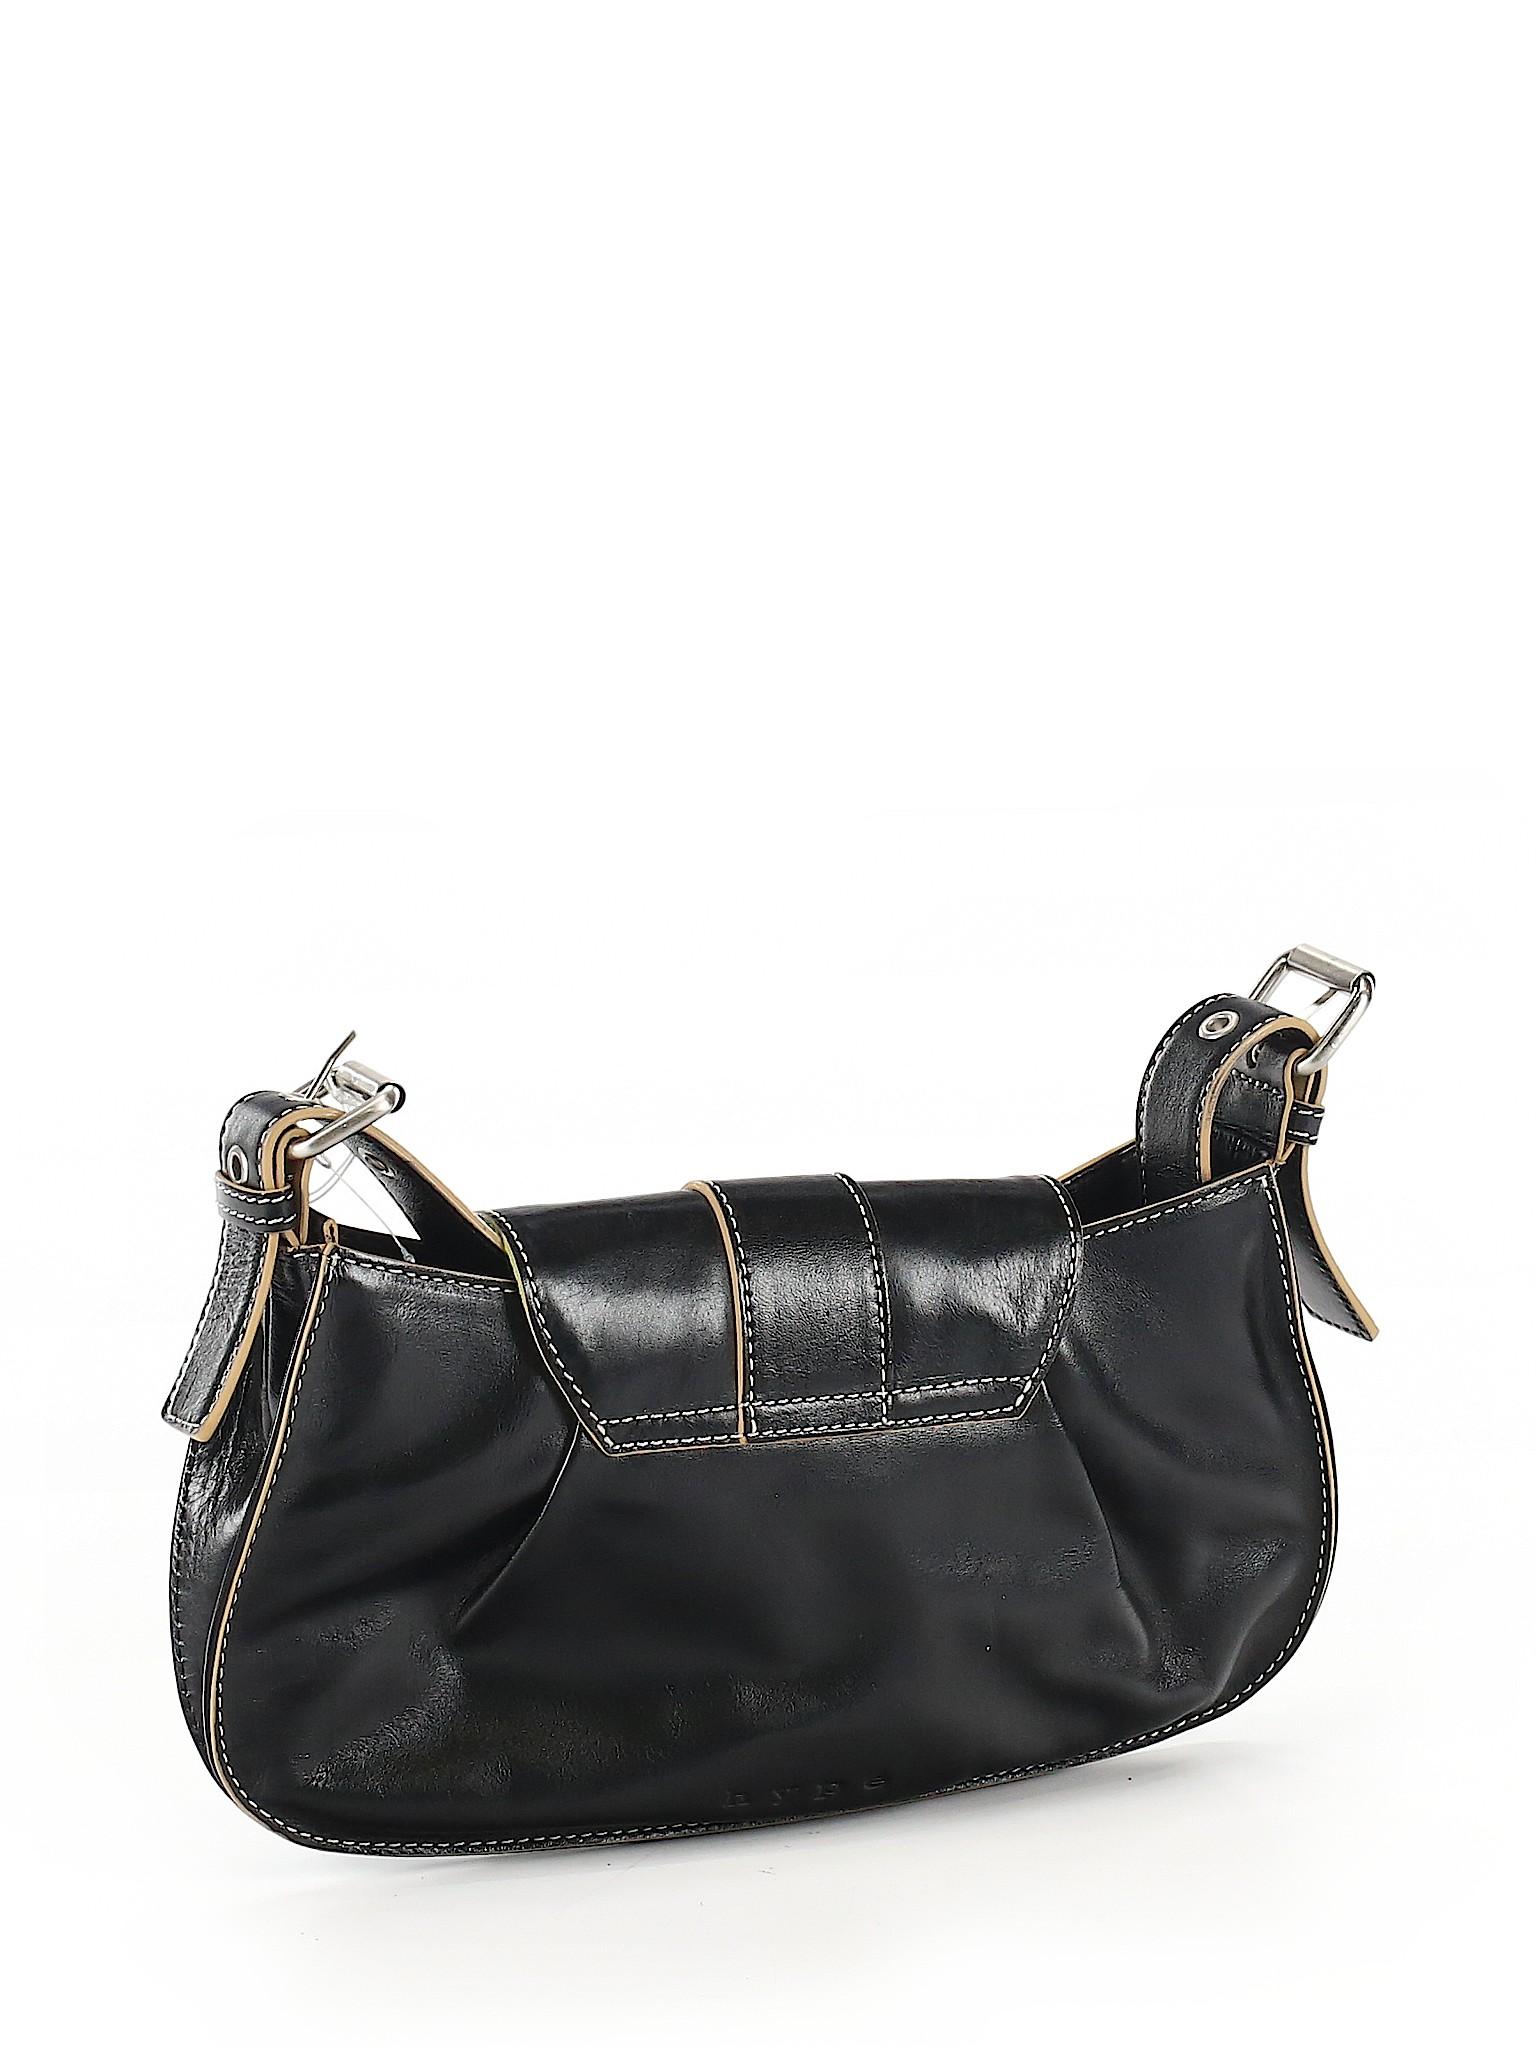 1de907f3f00 Hype Handbags Price   Brydens Xpress